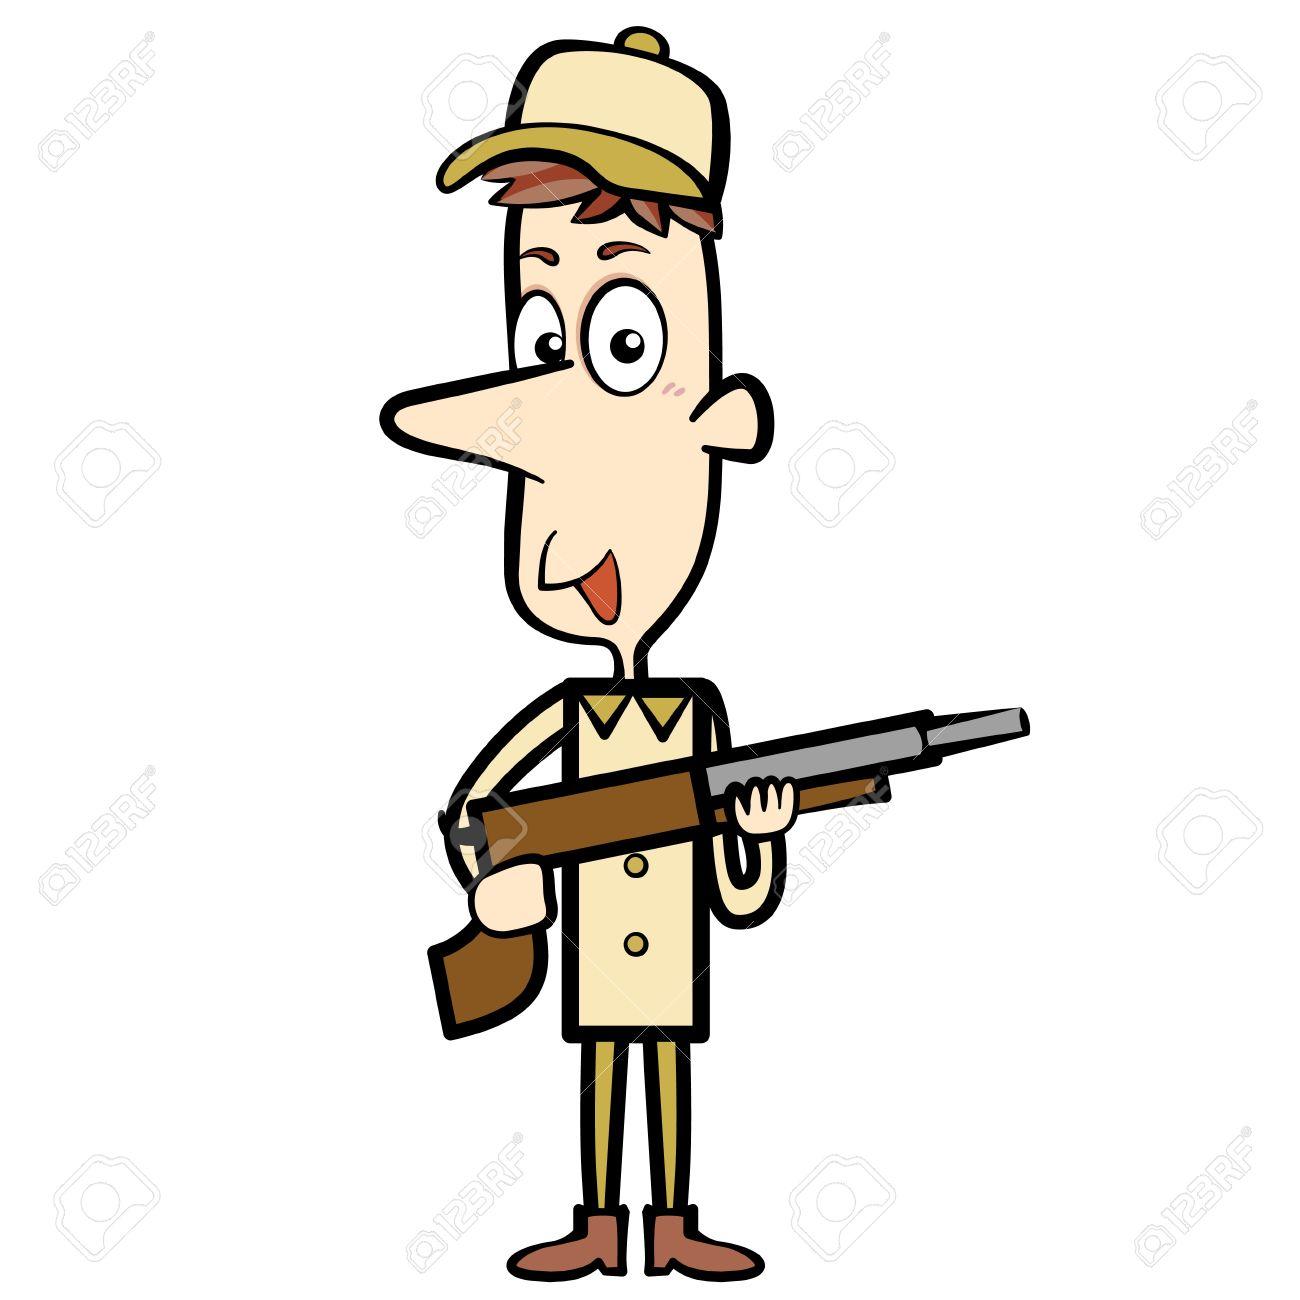 1300x1300 Cartoon Hunter With A Shotgun Royalty Free Cliparts, Vectors,